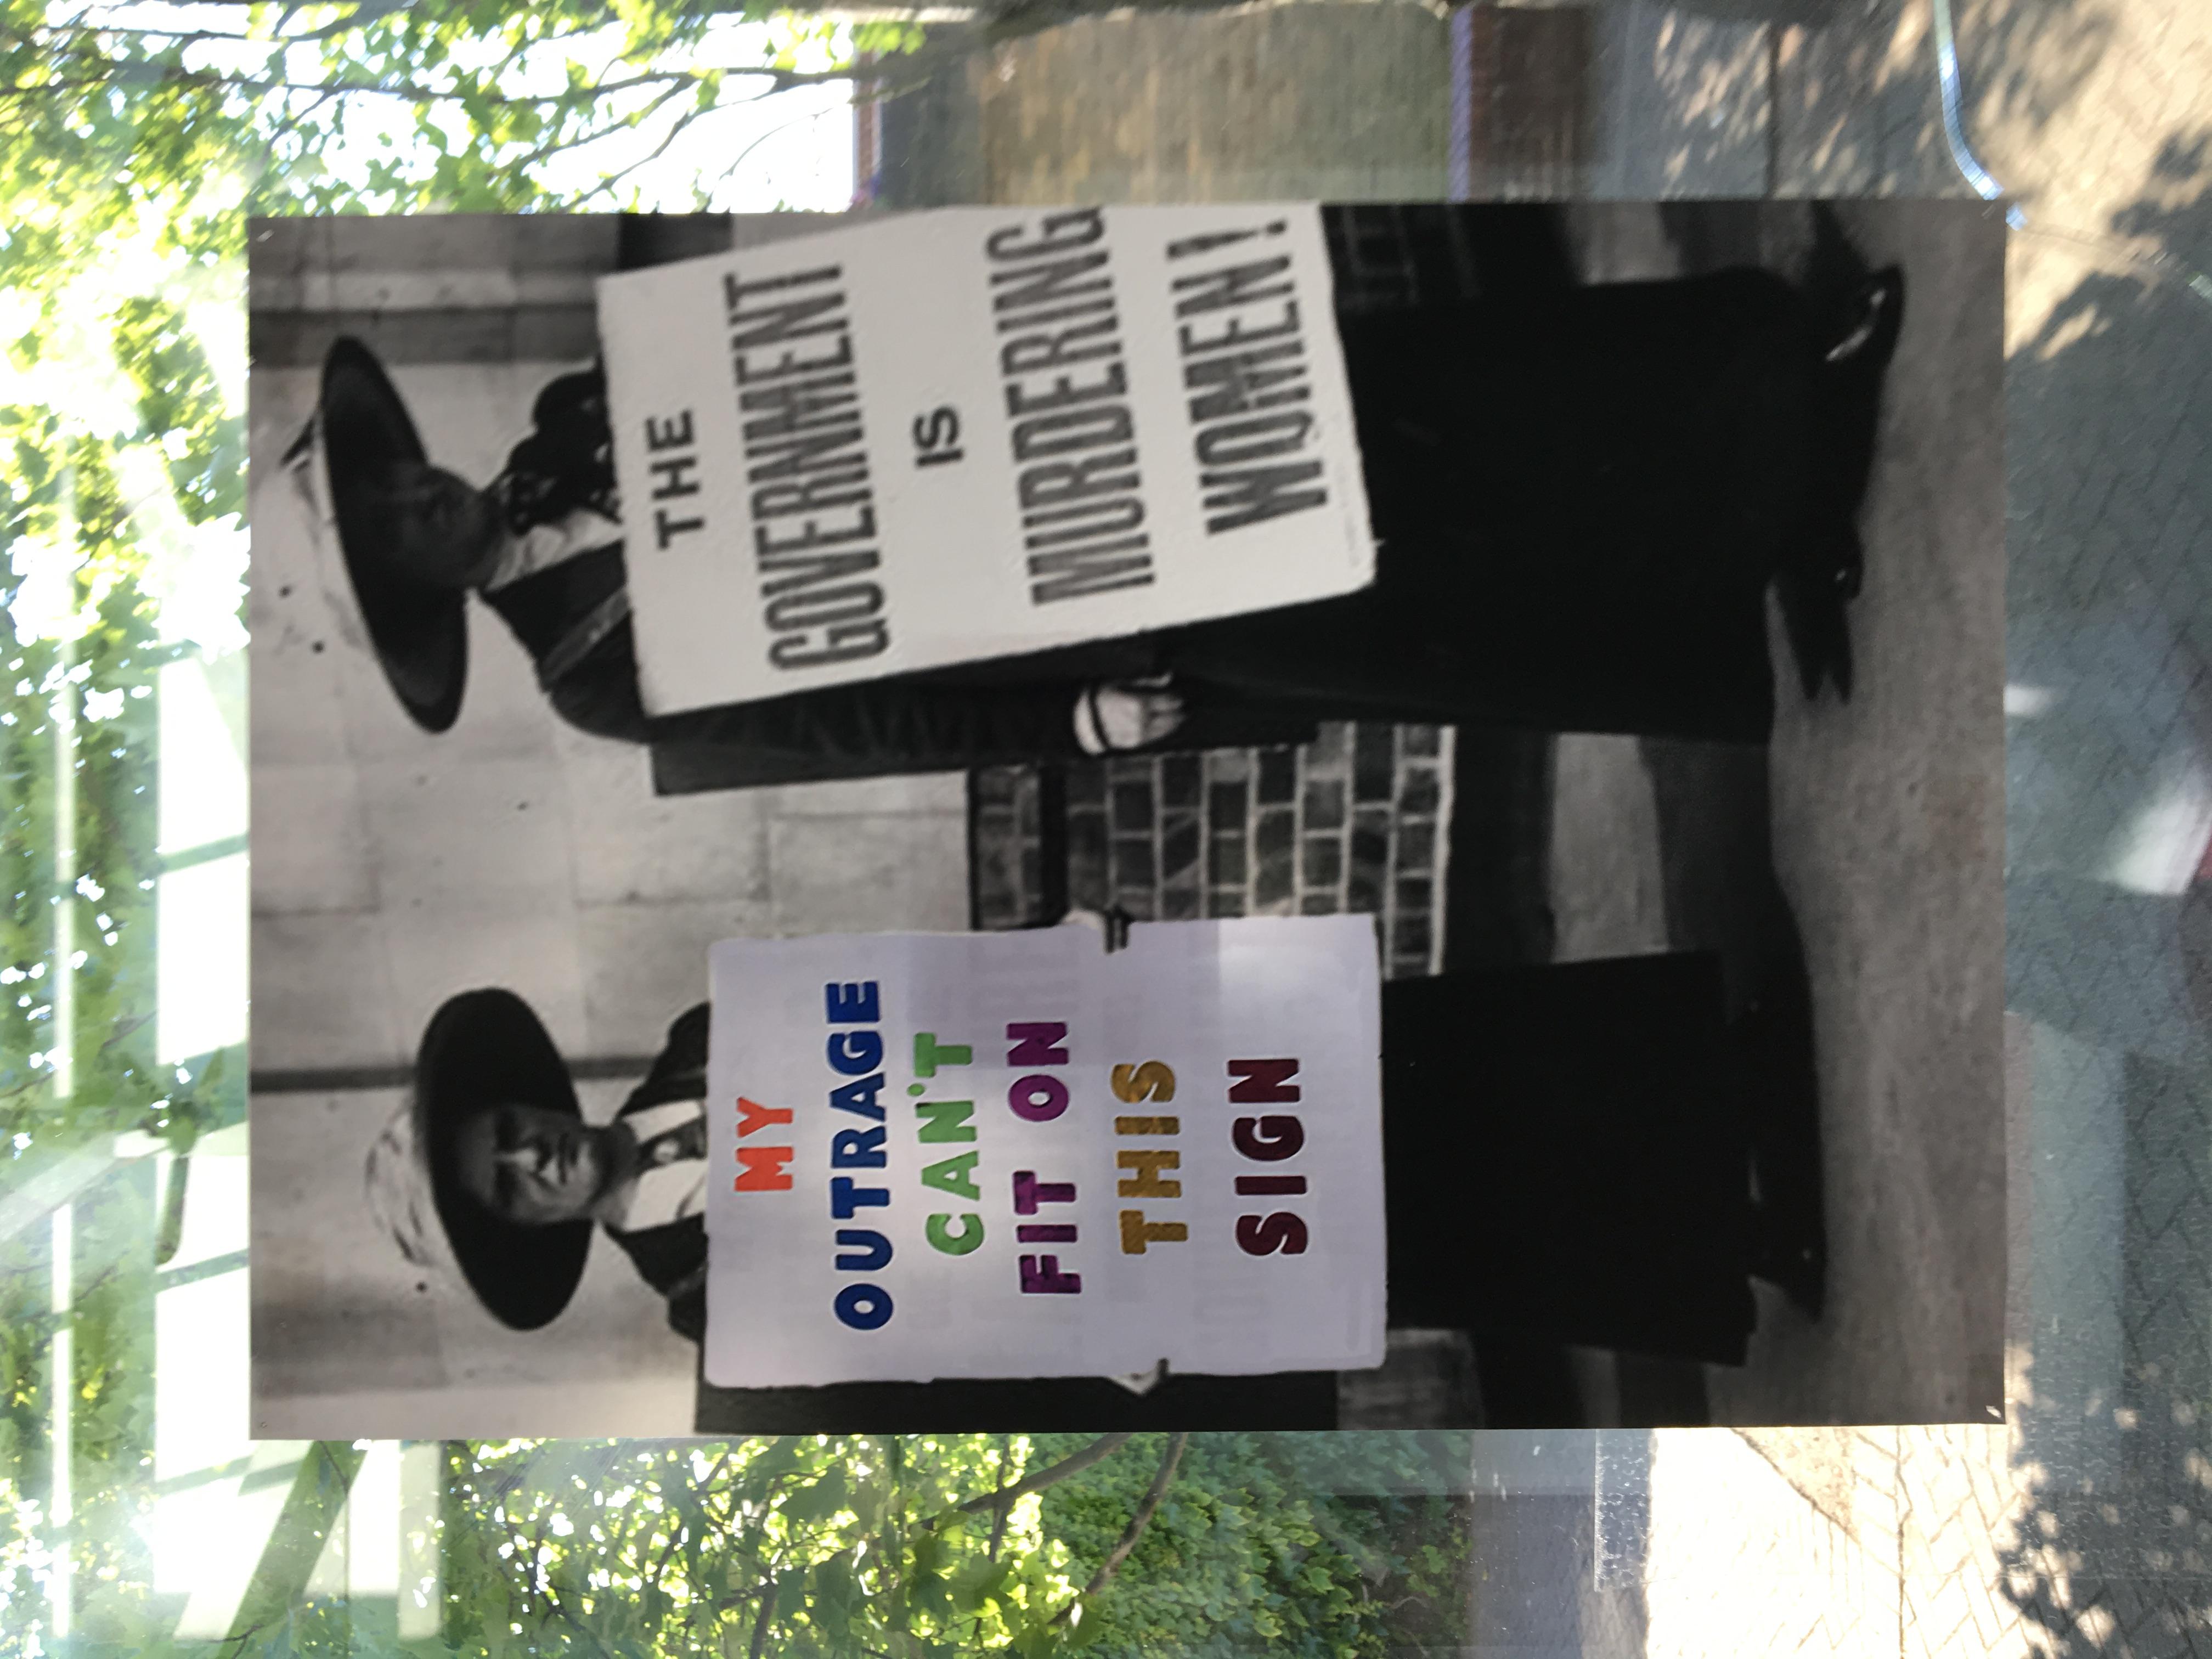 58c. Suffragette Marches, Felicity Beaumont, 40.5 x 59 x 0.1, £ offers